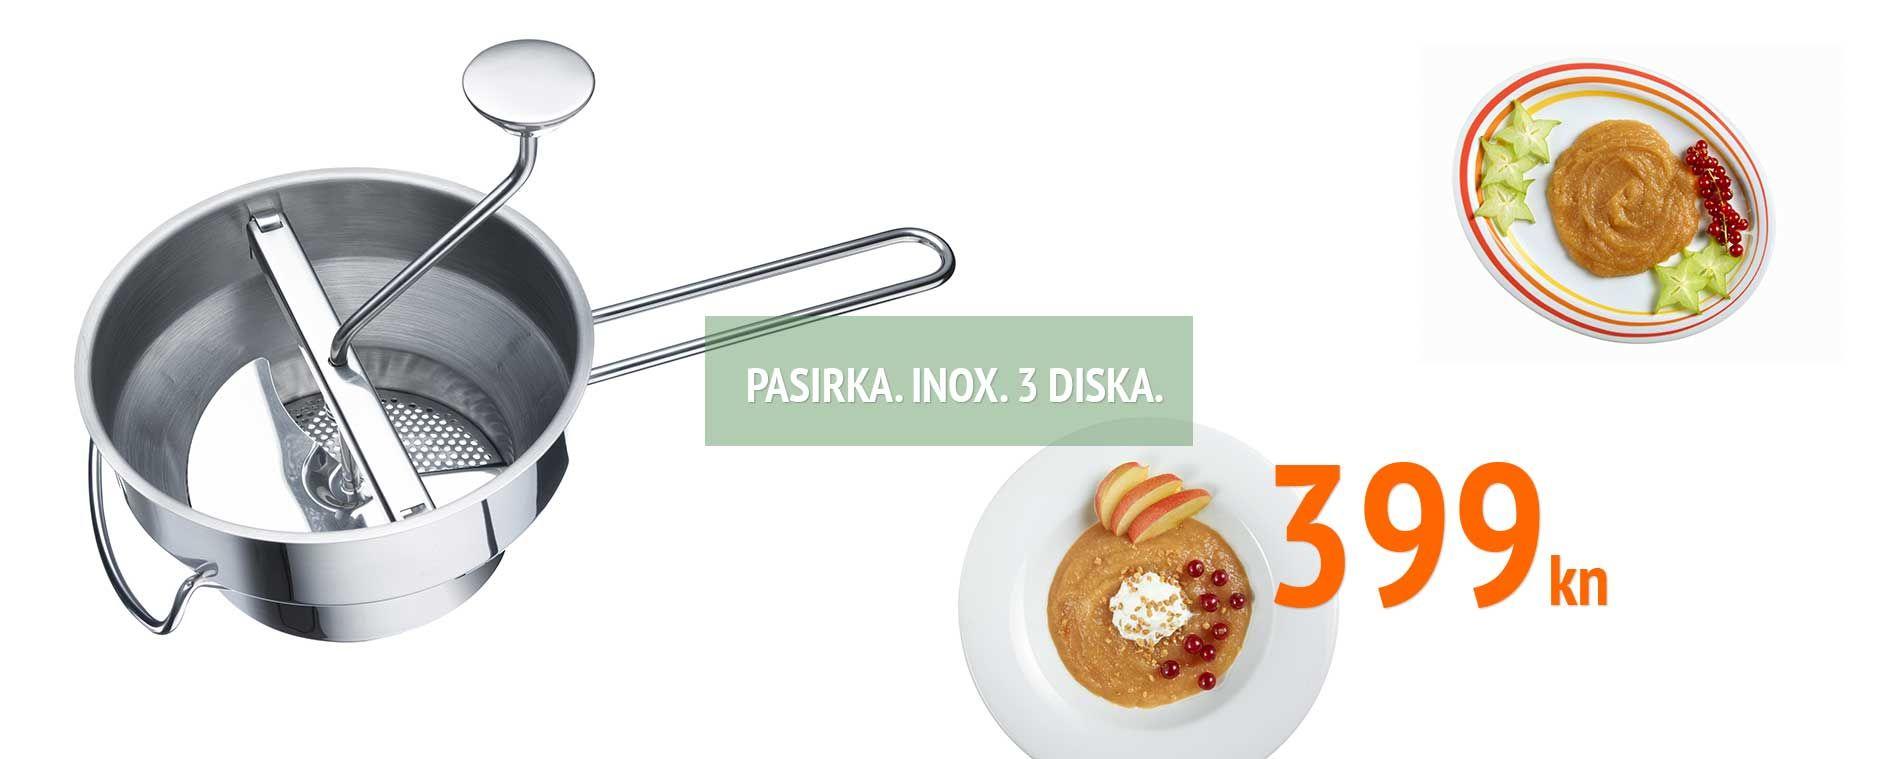 http://www.kuhinja.net/pasirka-inox-s-3-diska-finoletta